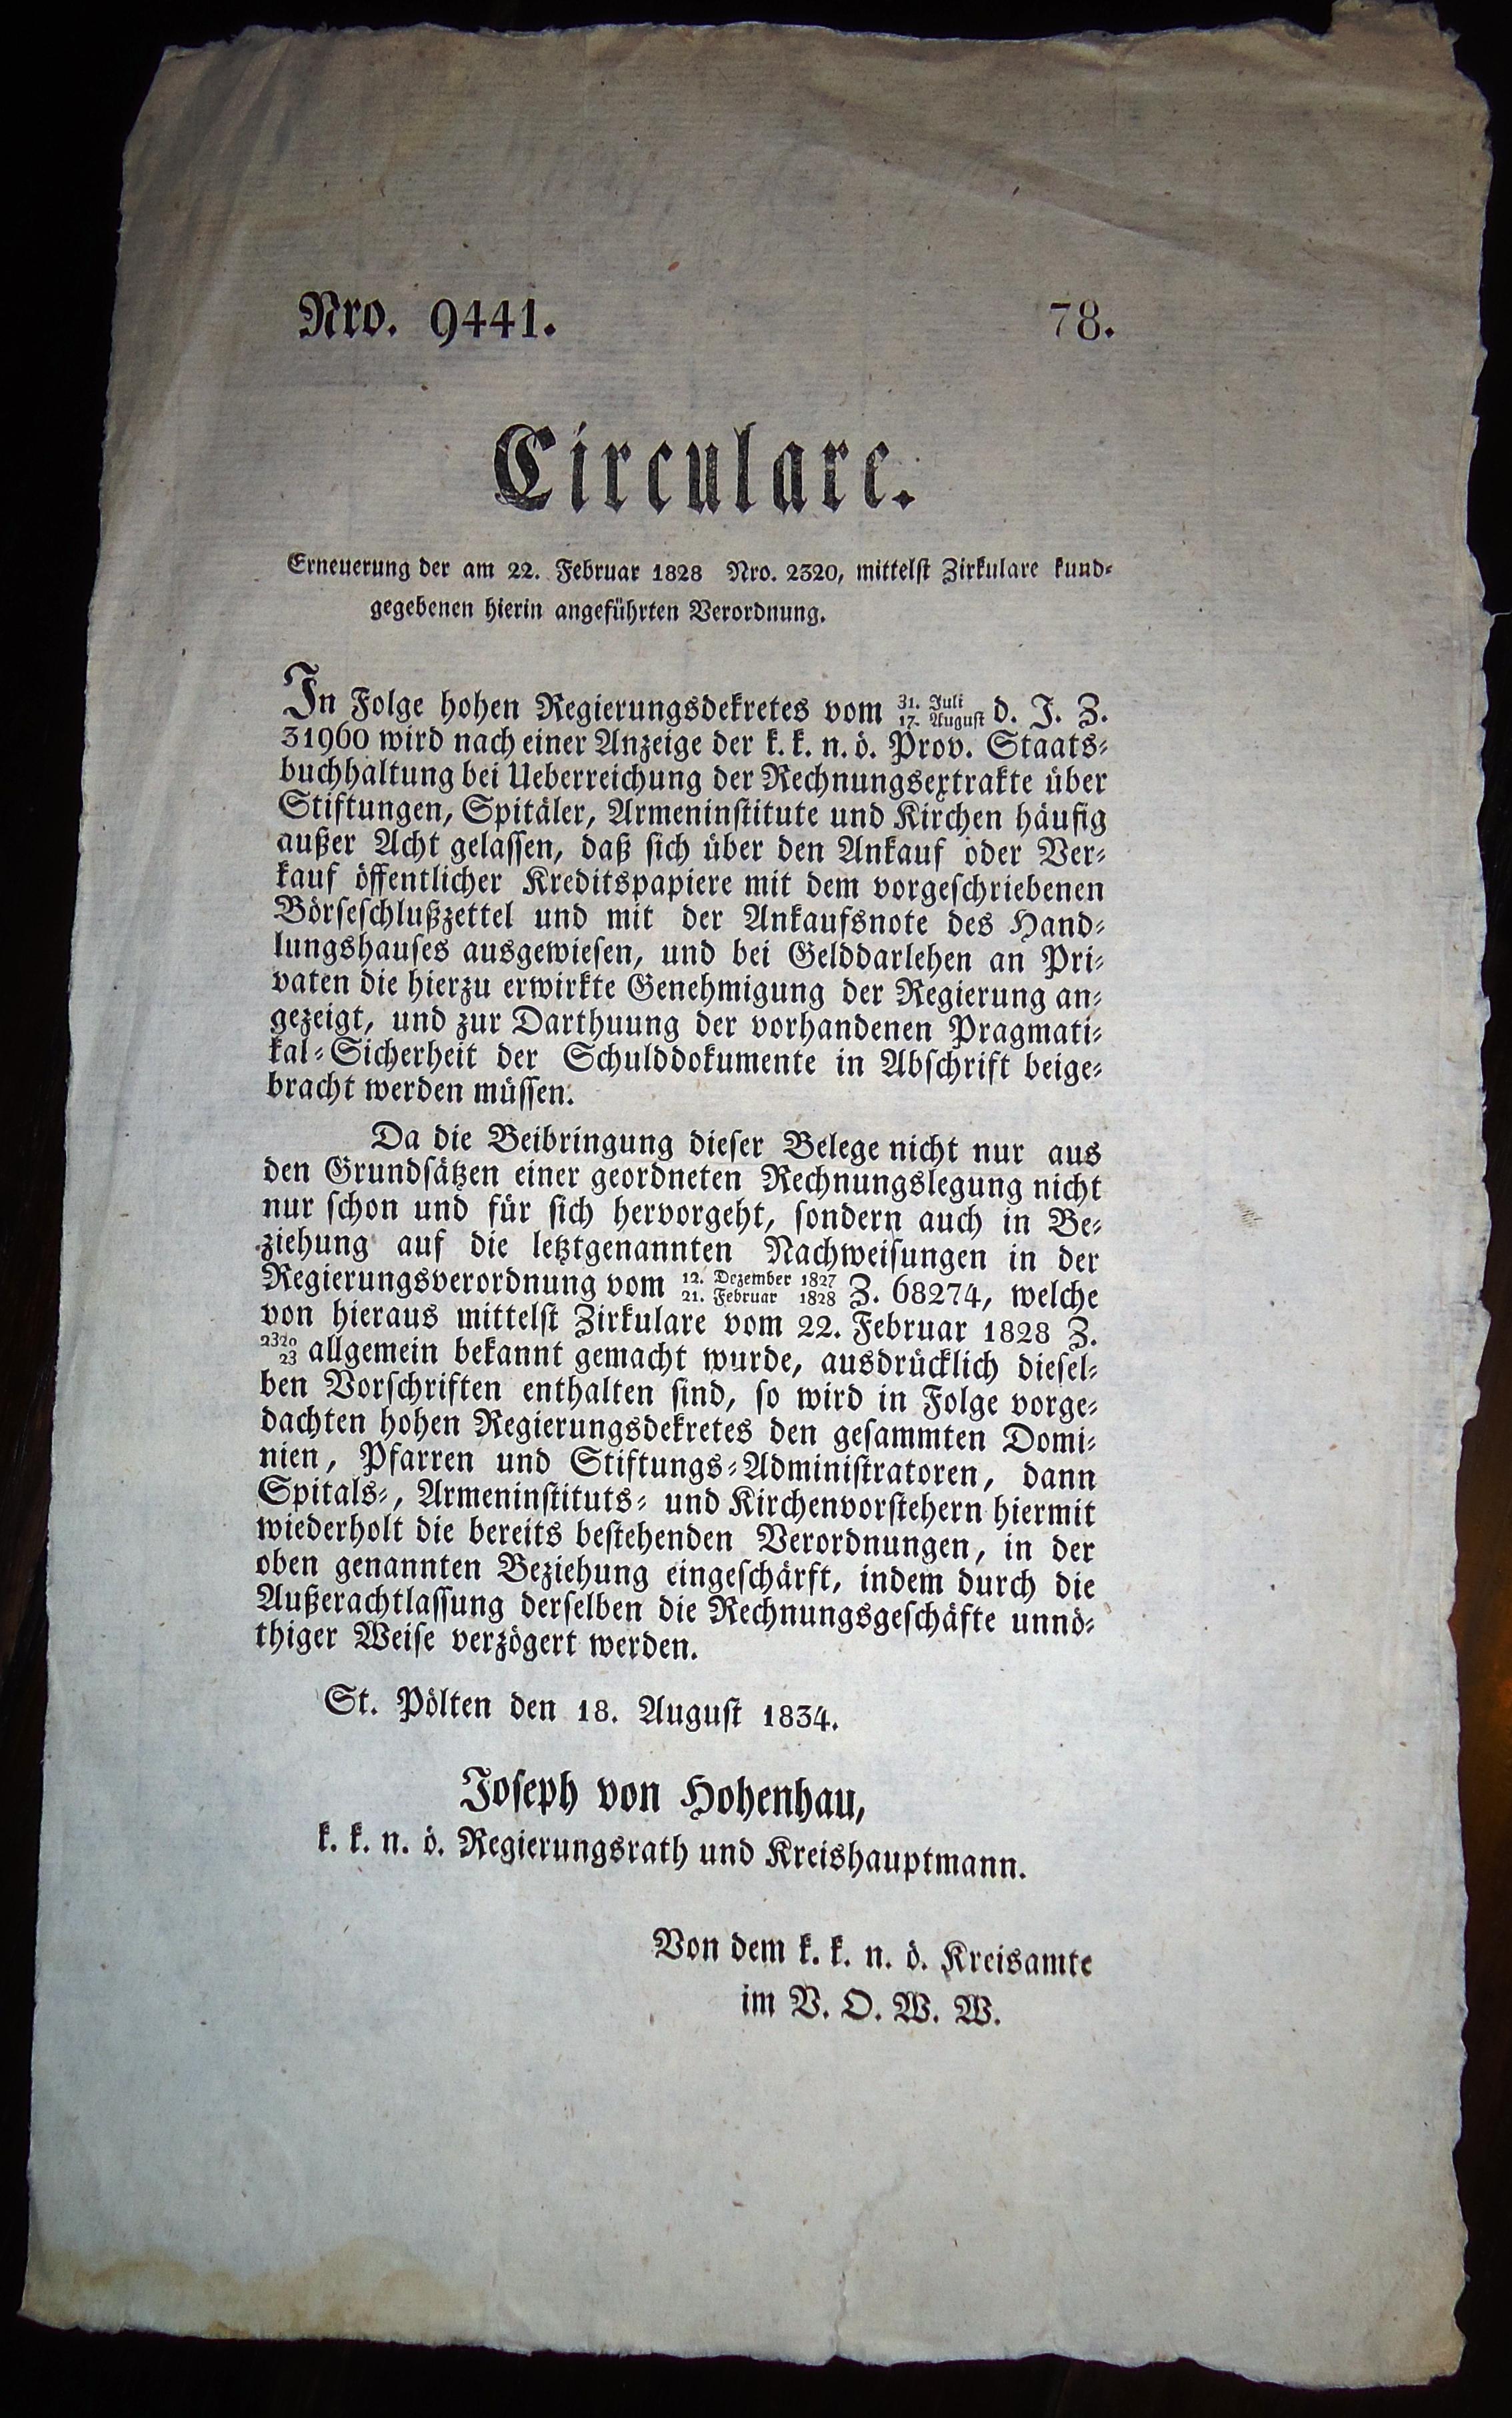 Circulare Nro. 9441/78 von 18.8.1834,